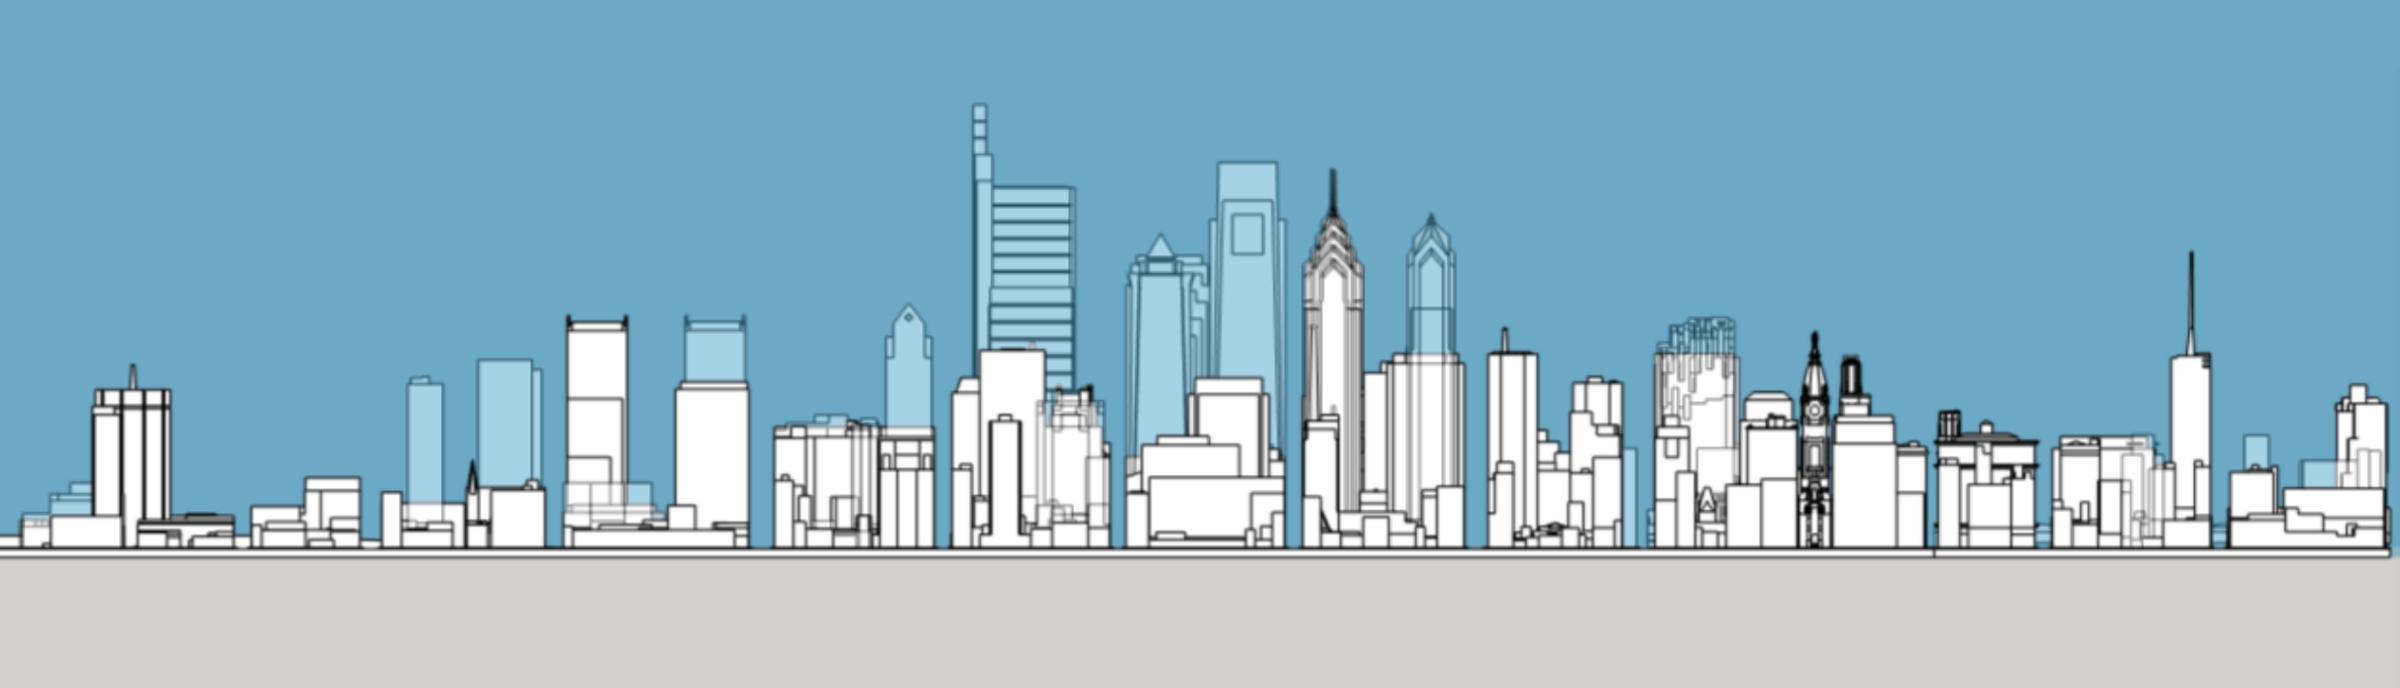 Philadelphia 1987 and 2020 south elevation. Model and image by Thomas Koloski